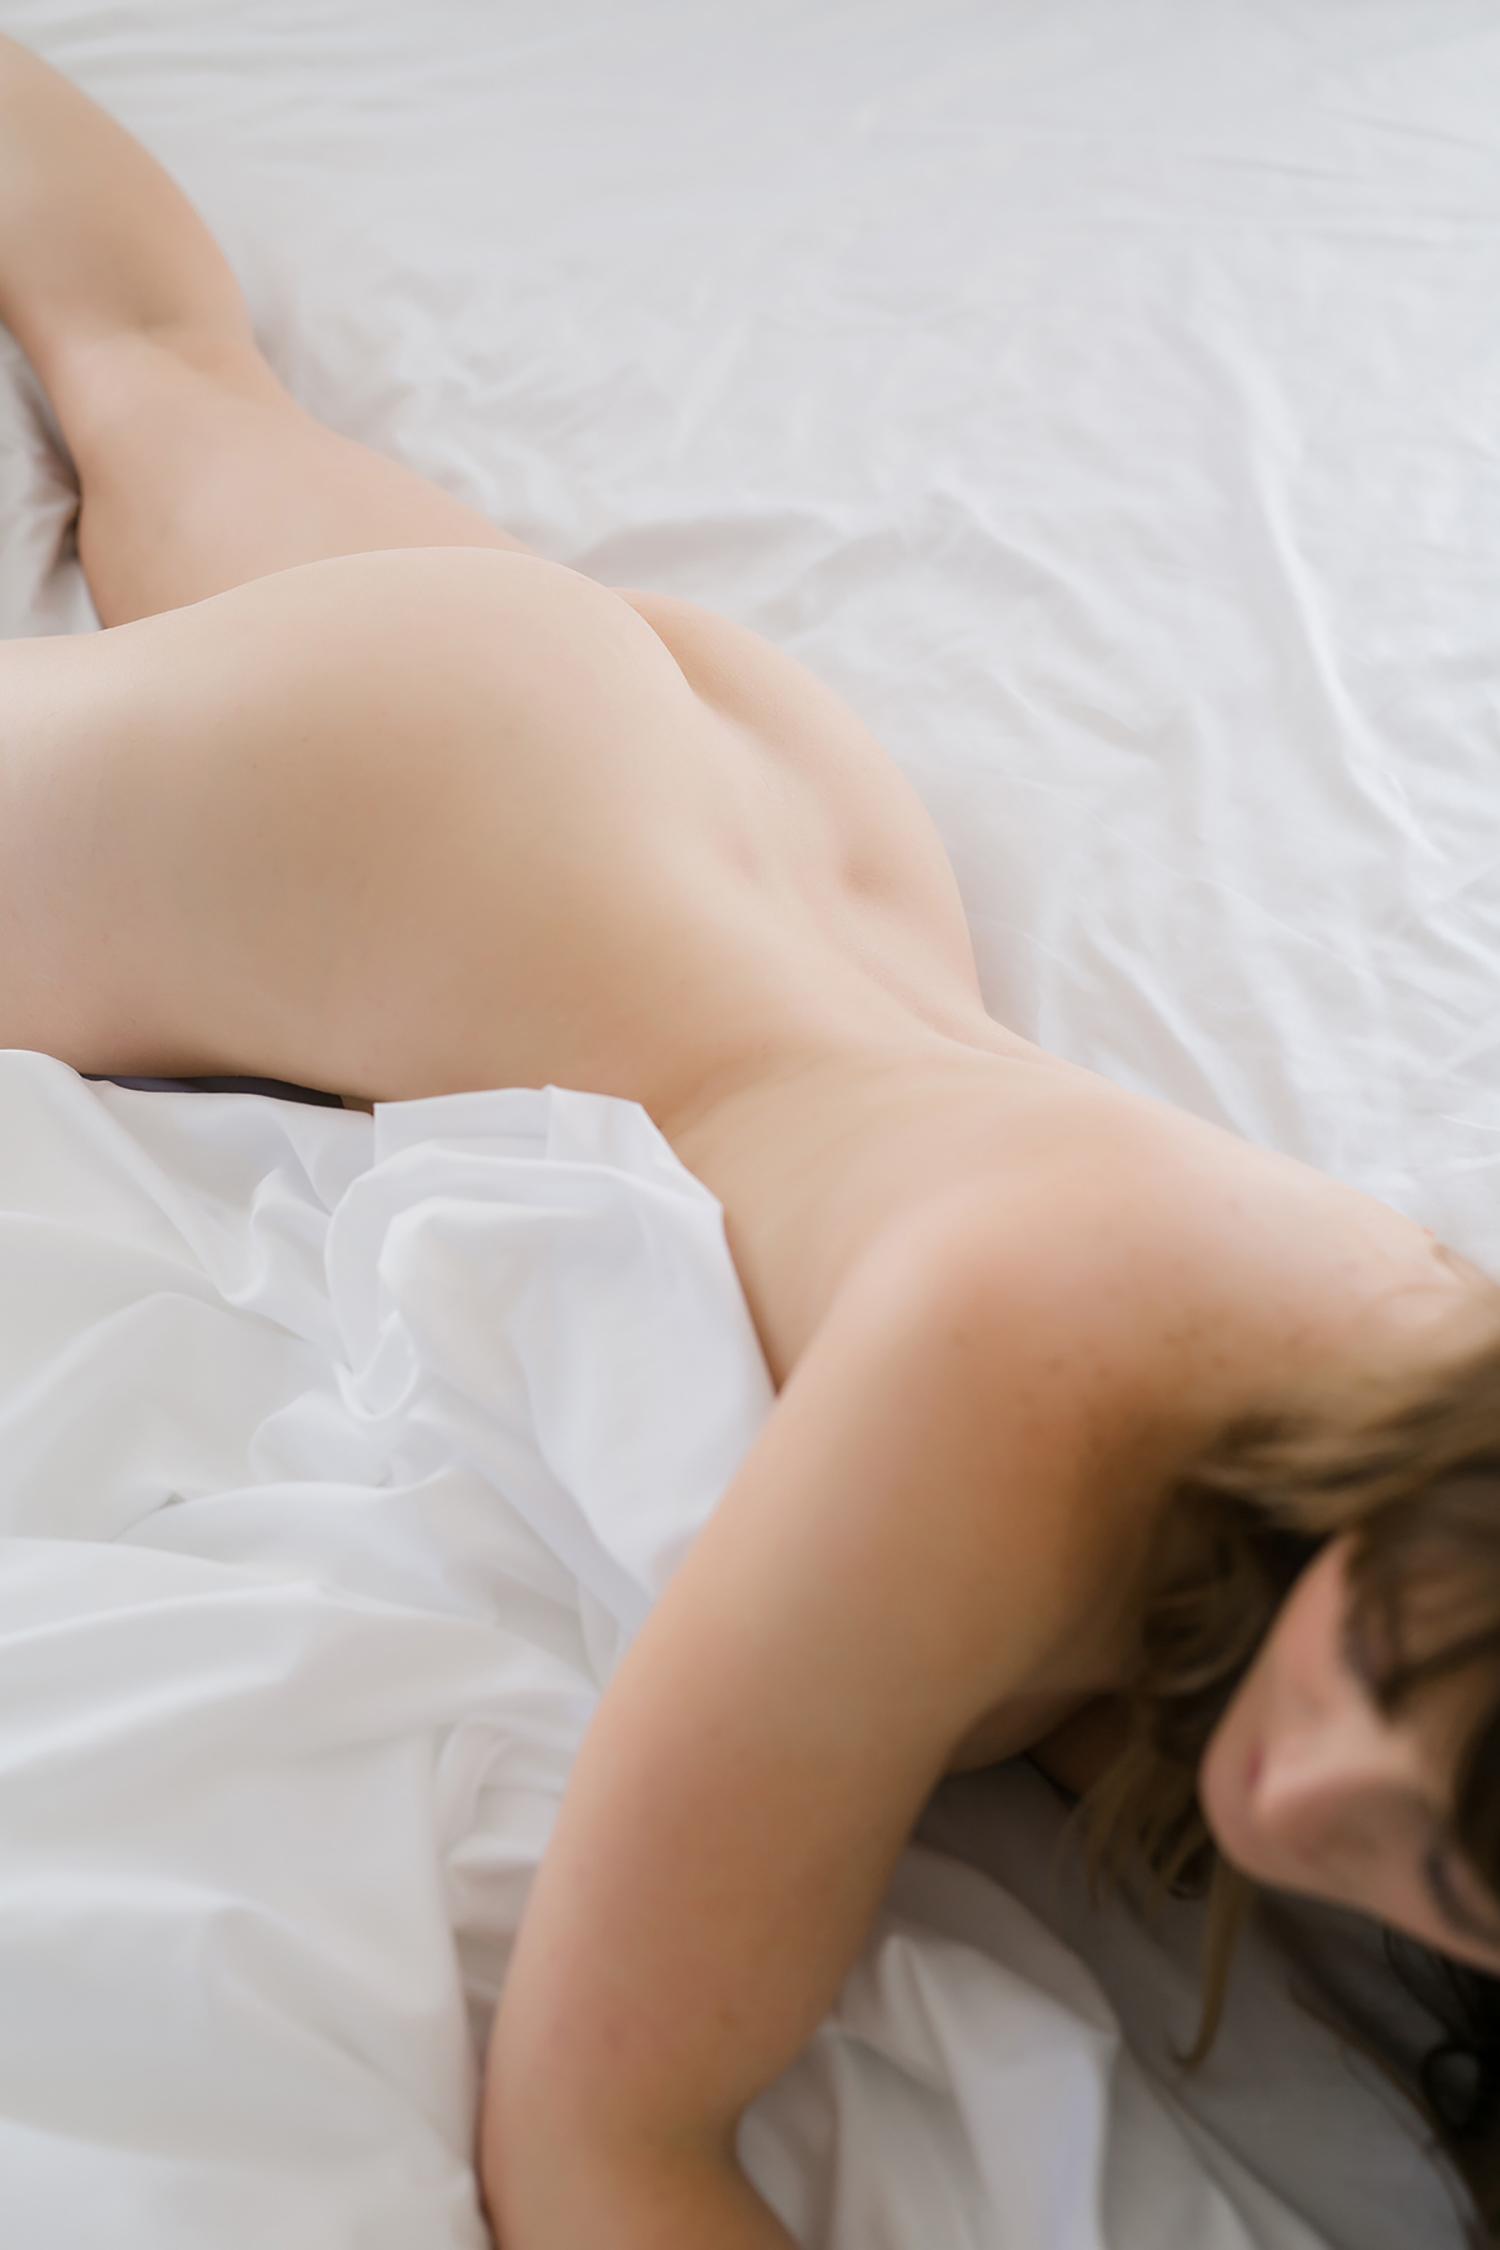 austin-atx-boudoir-artistic-nudes--kbb29.jpg